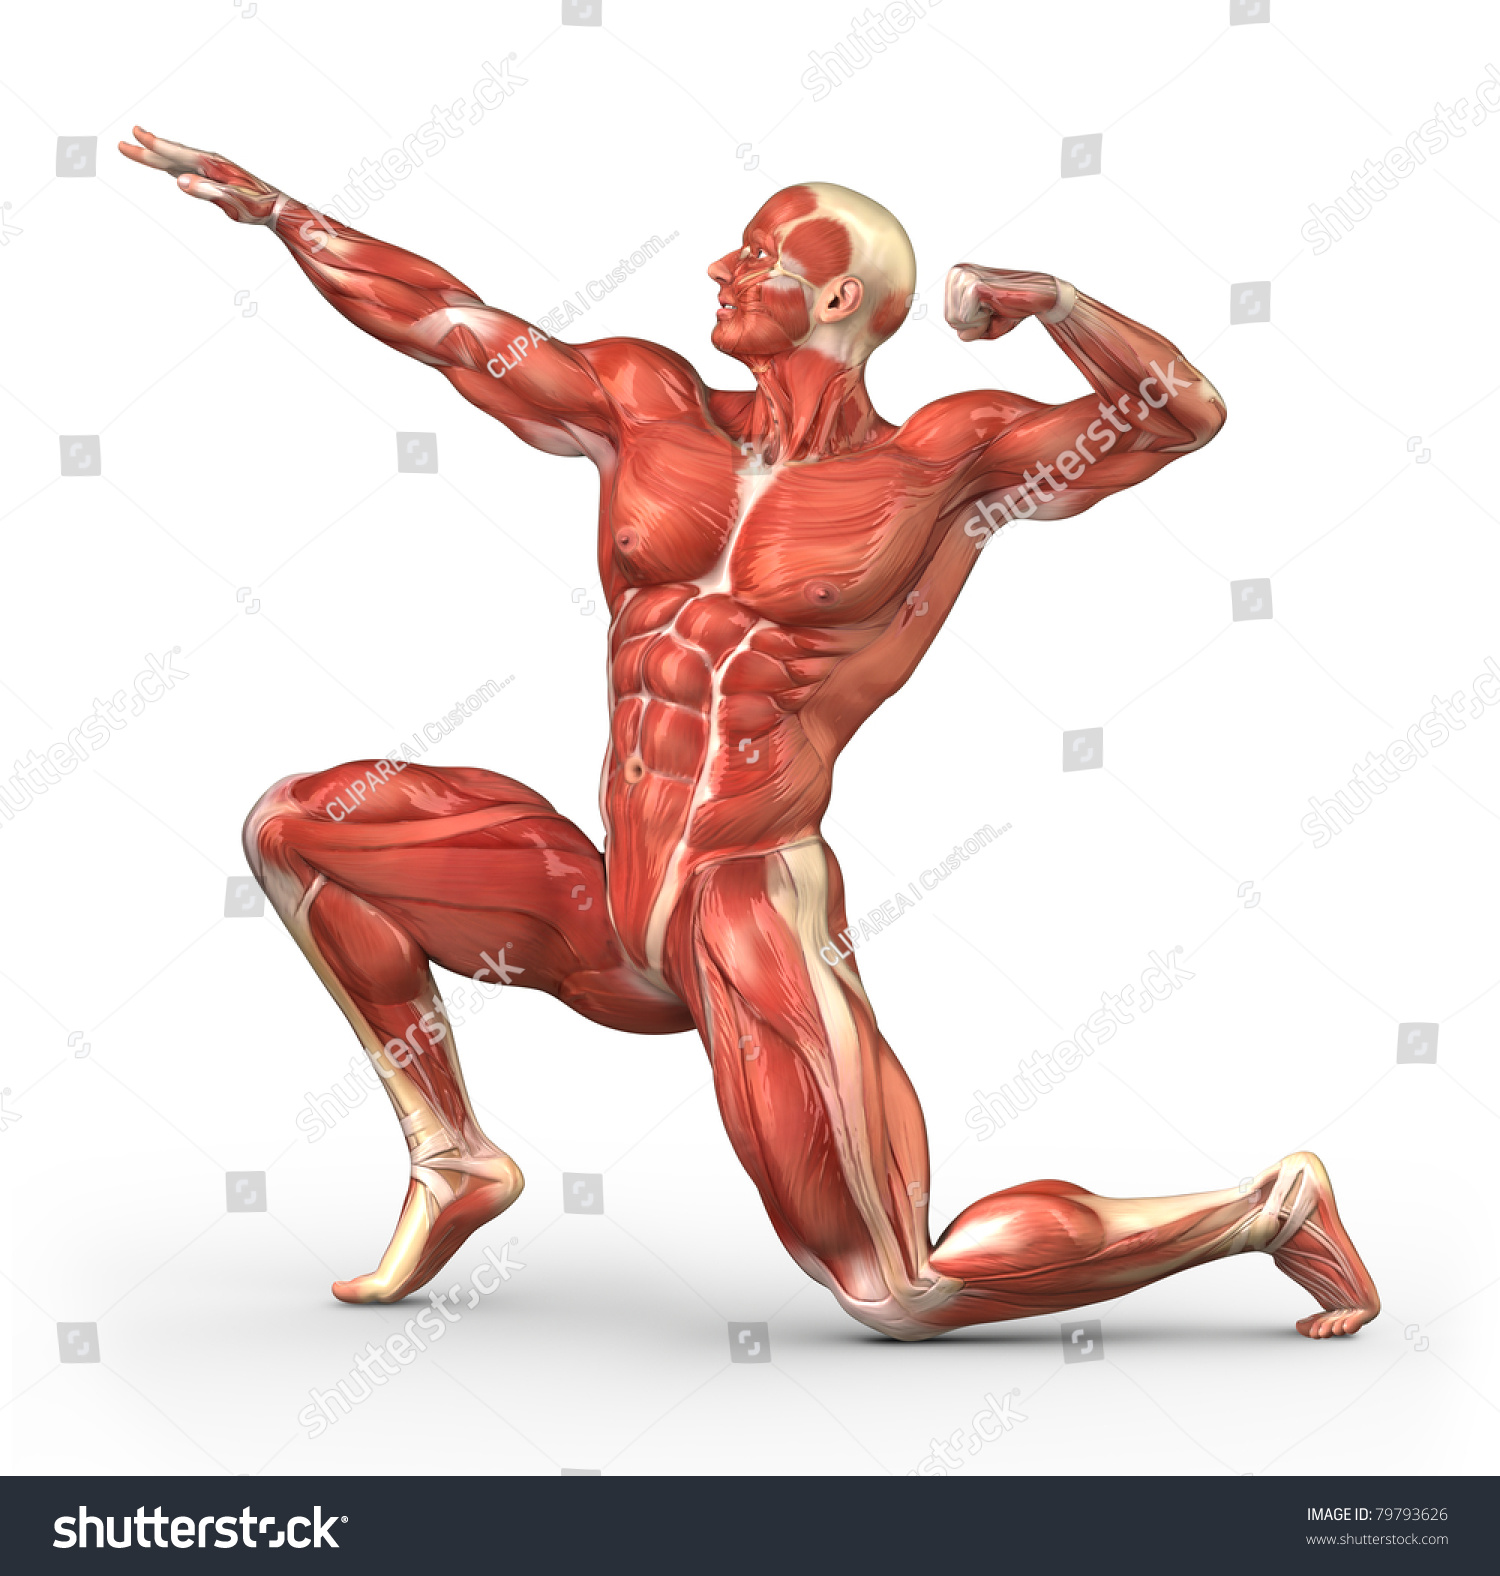 Male Muscular System Bodybuilder Position Stock Illustration